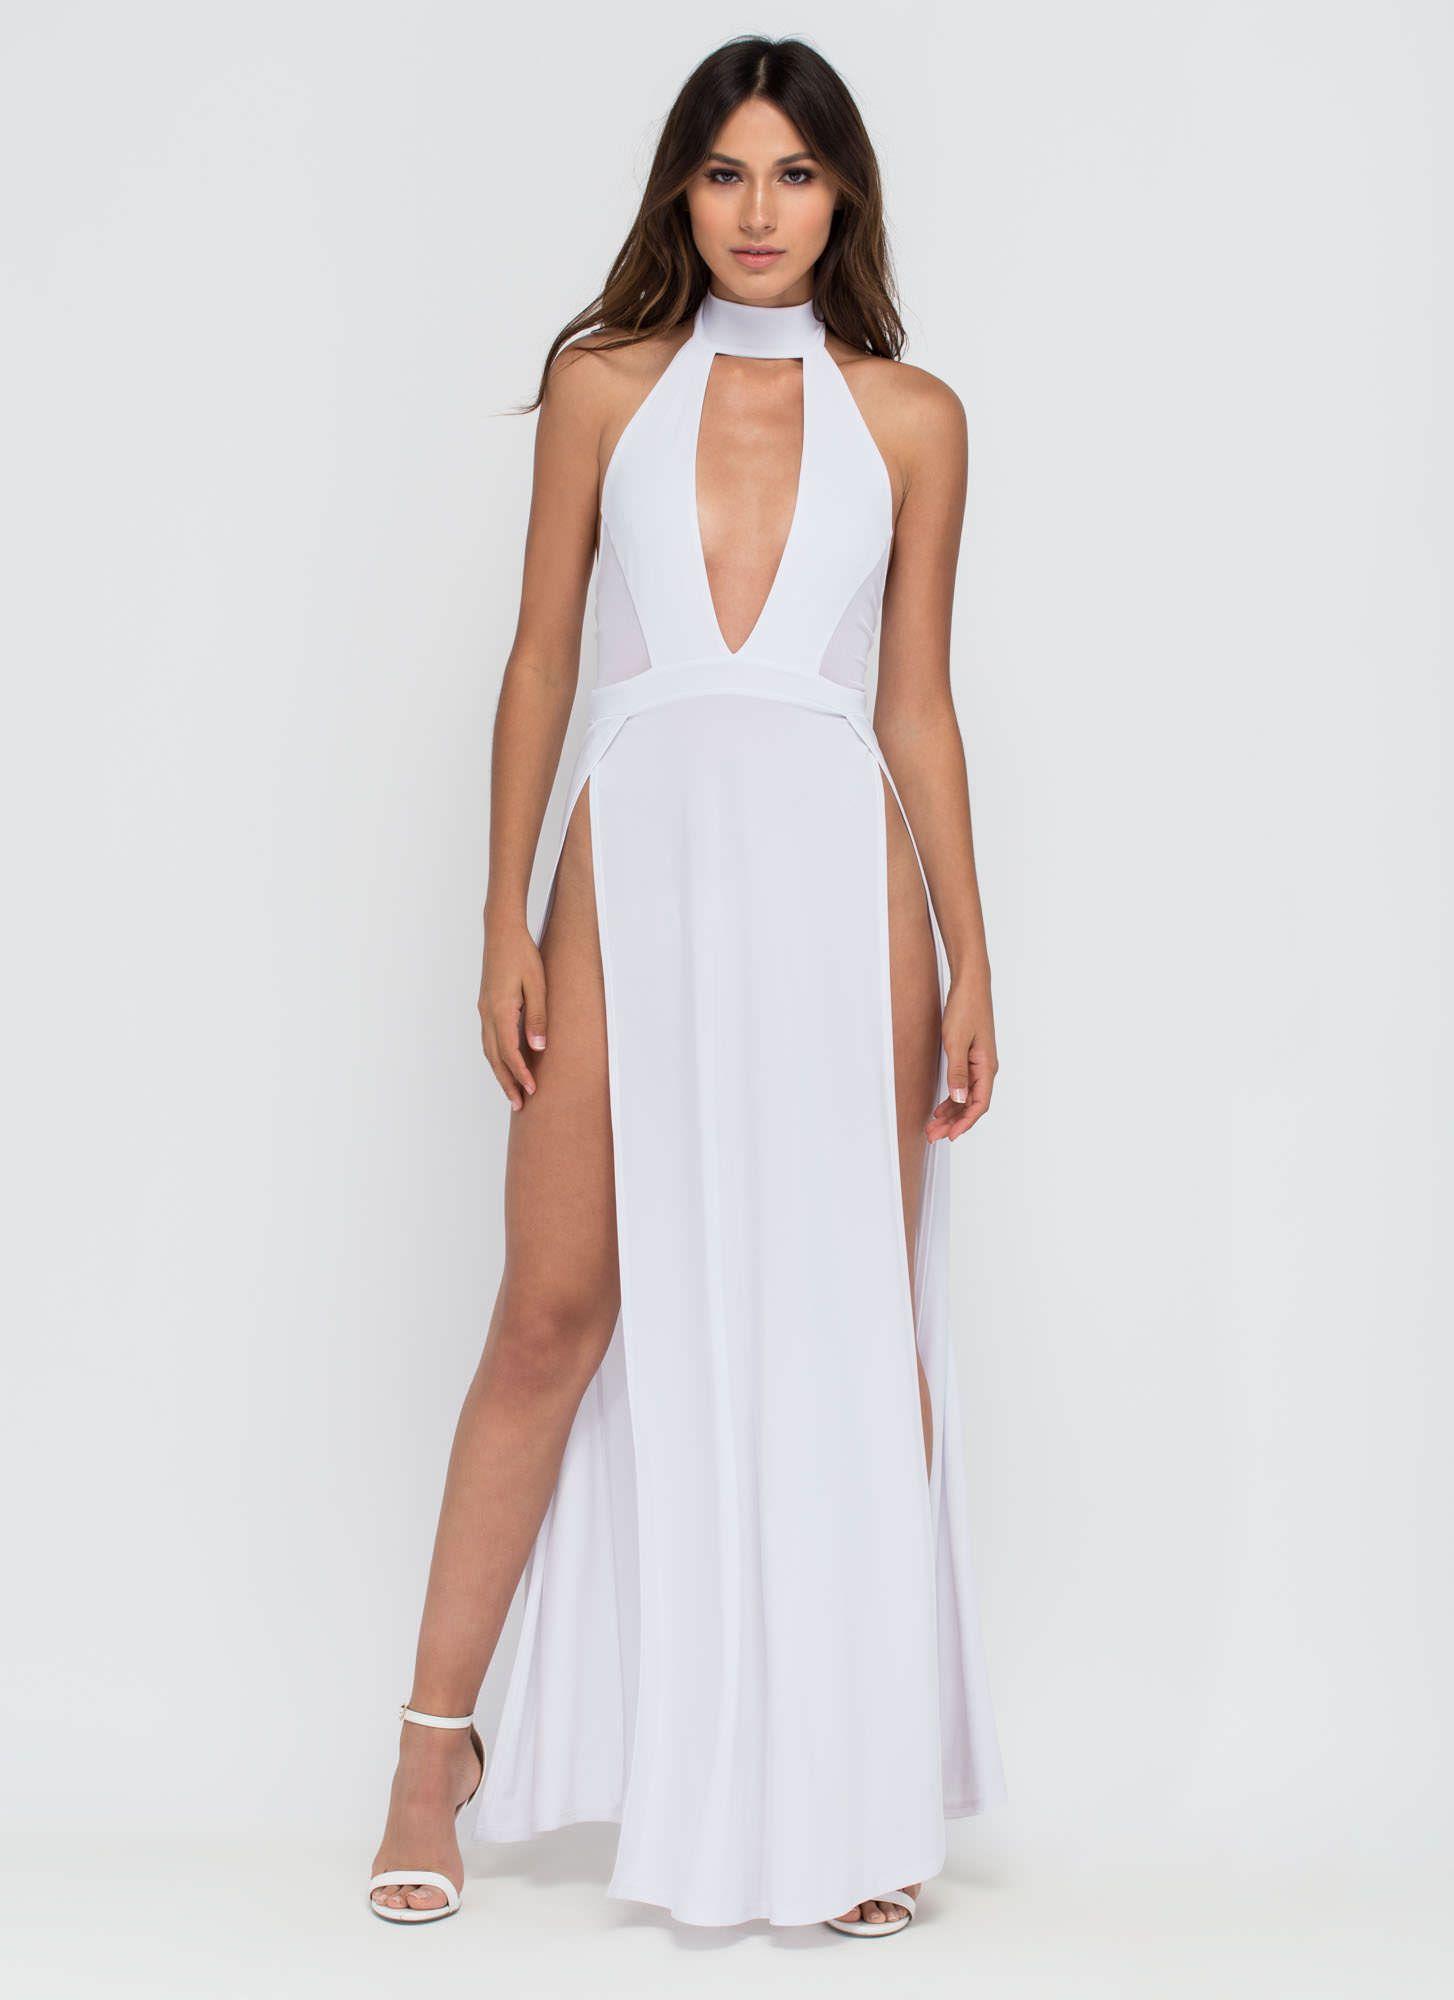 Legs For Days Plunging Slit Maxi Dress WHITE BLACK - GoJane.com ...